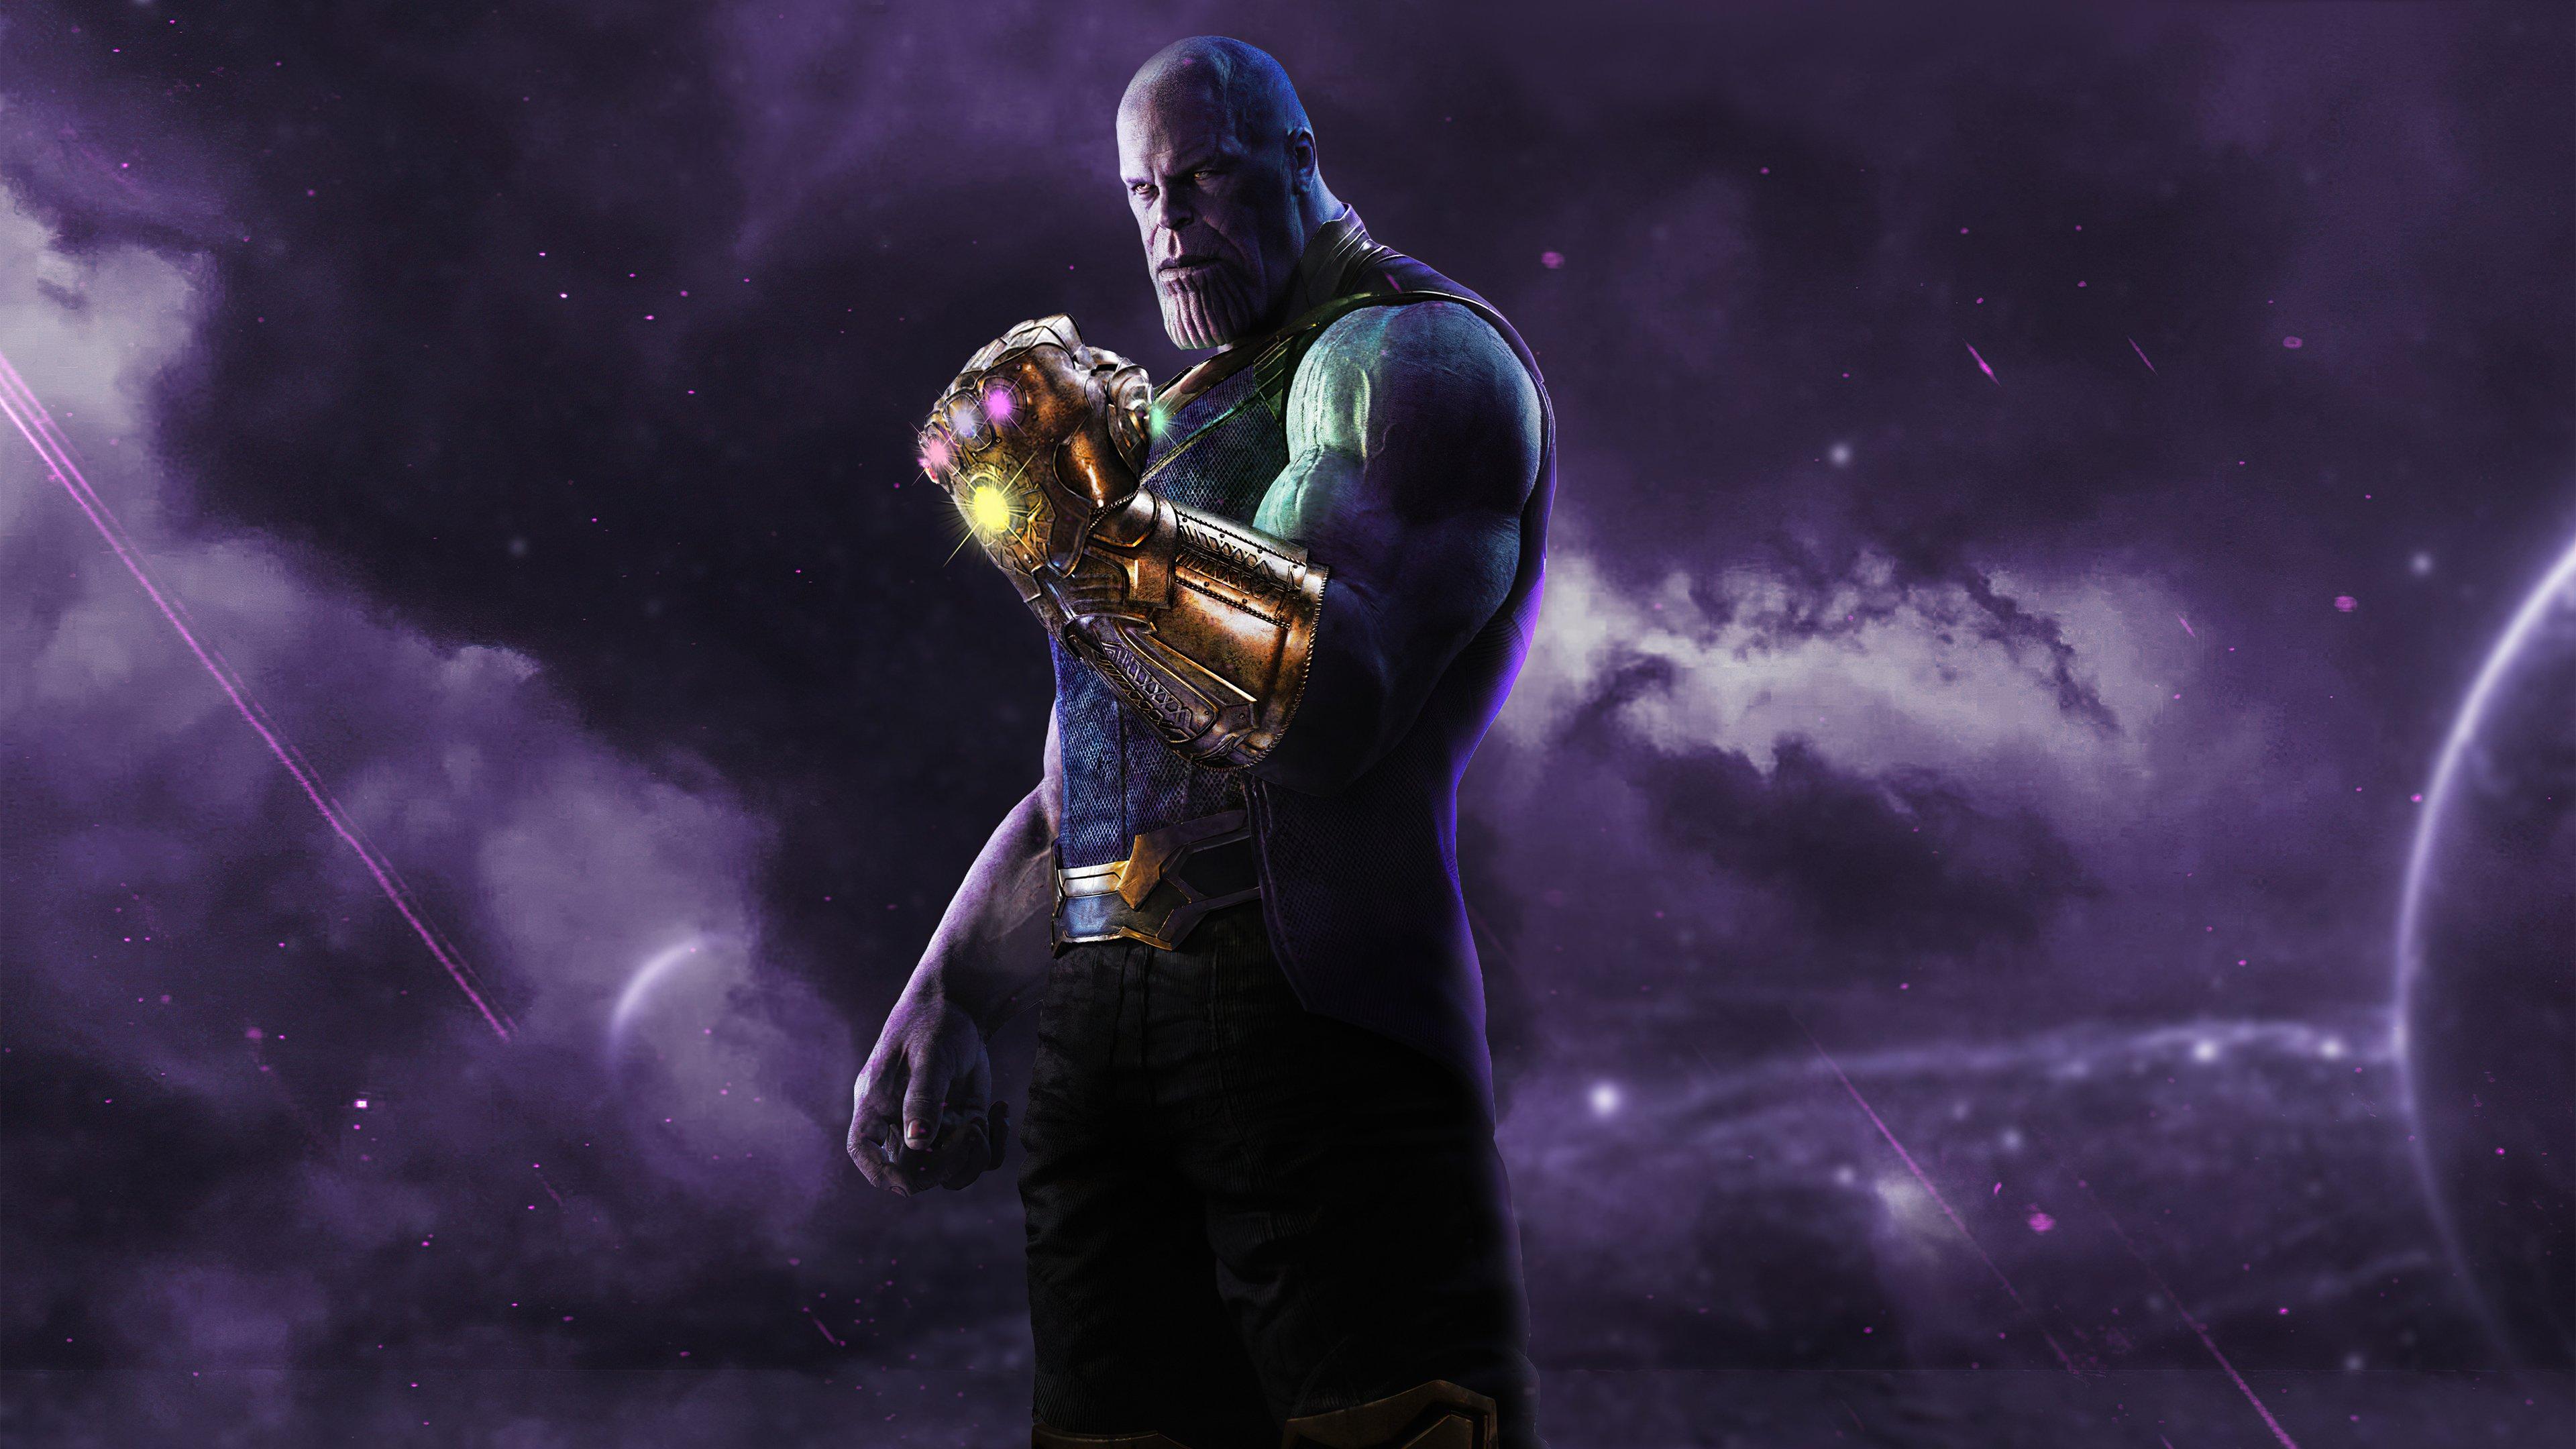 Wallpaper Thanos The Mad Titan